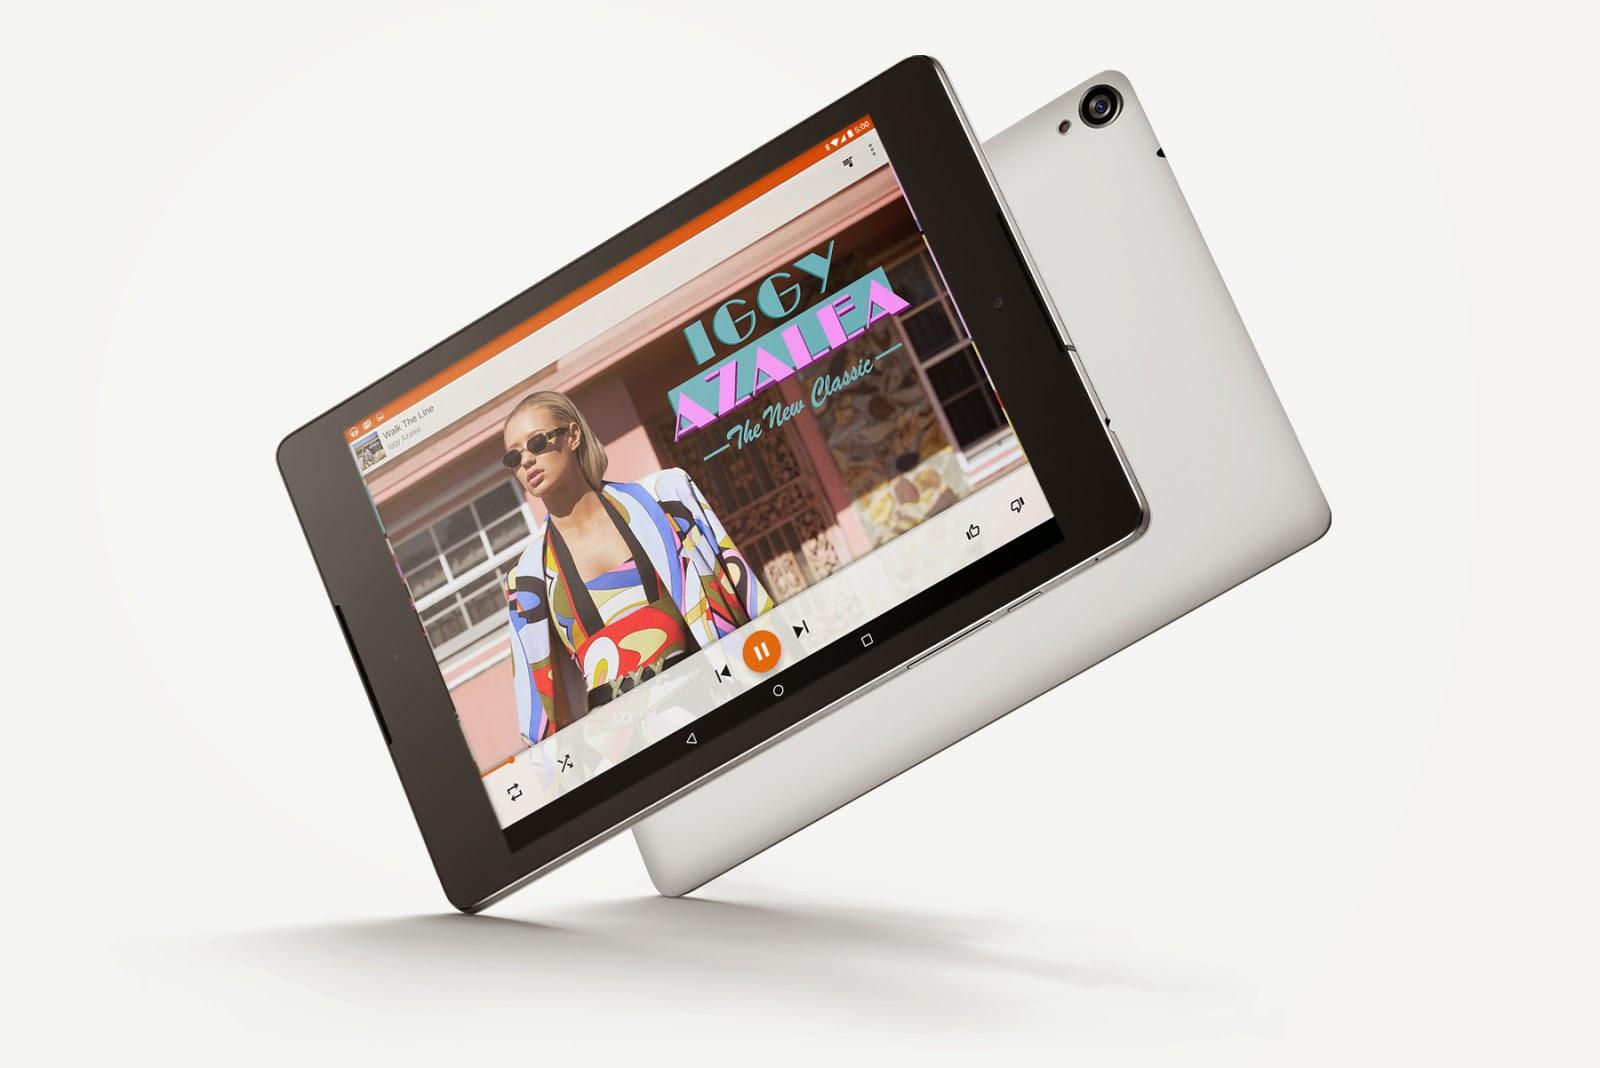 Nexus 9 official htc